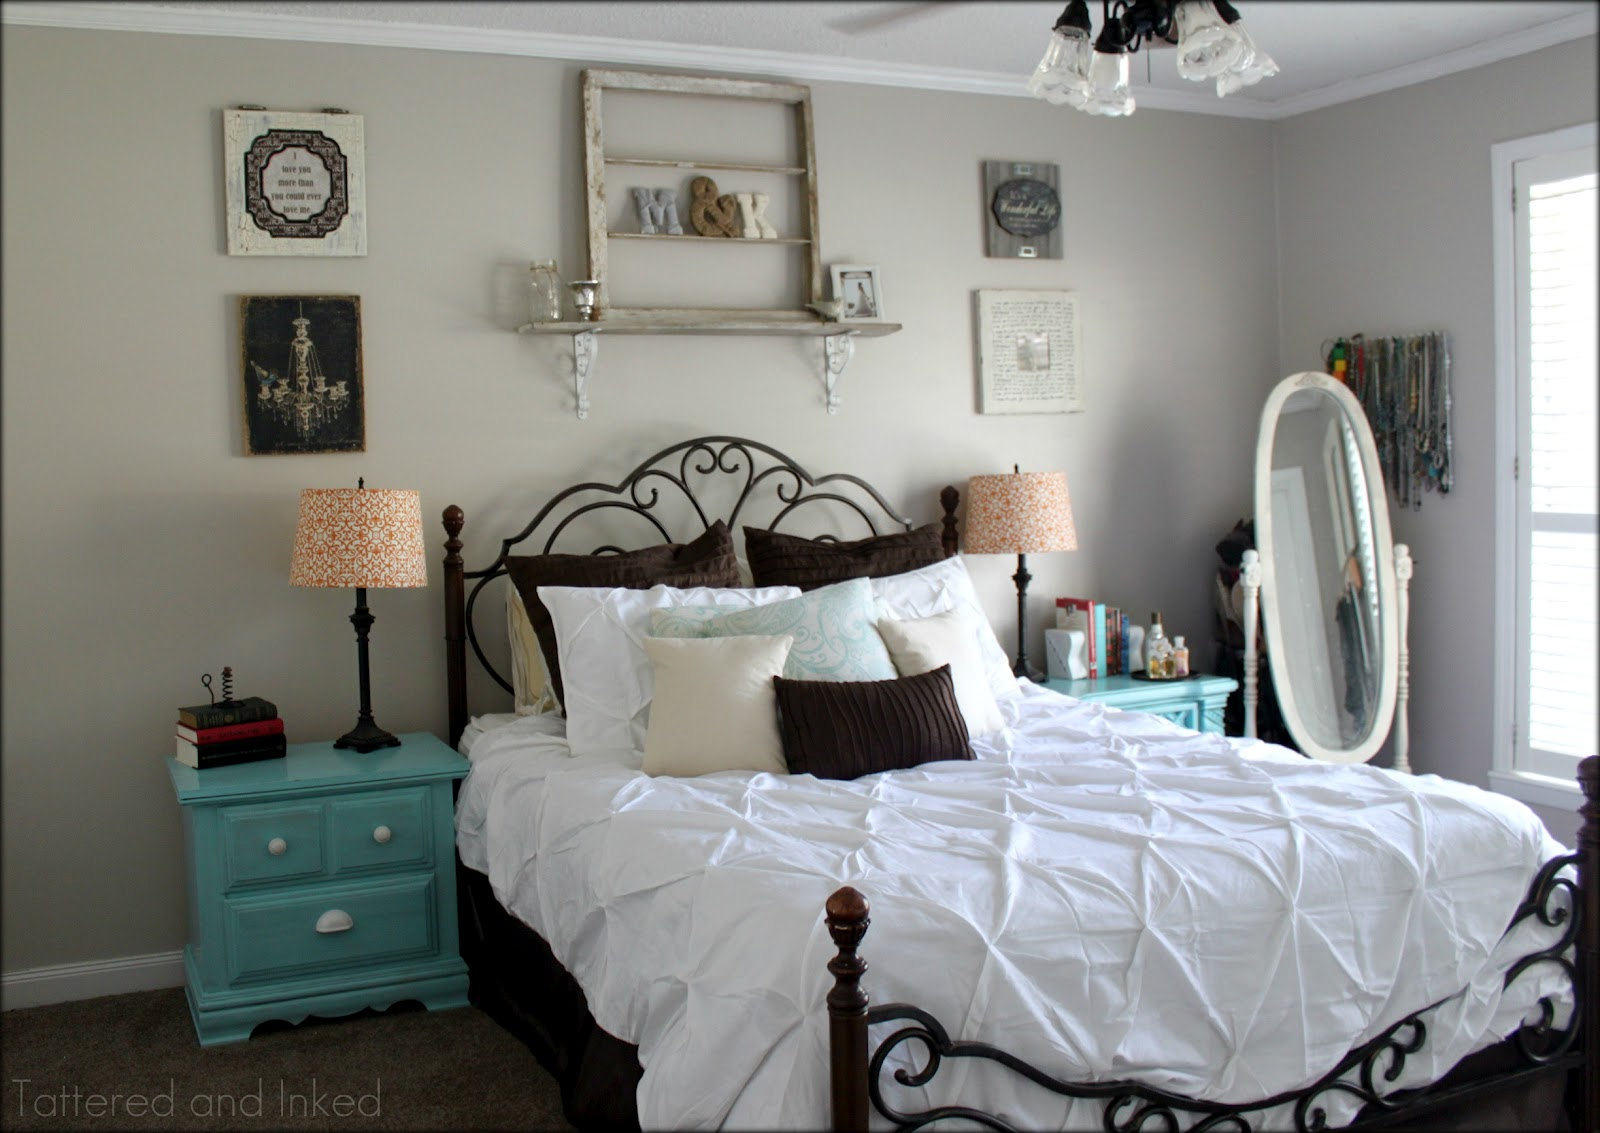 Tattered And Inked Aqua Tangerine Master Bedroom Redo